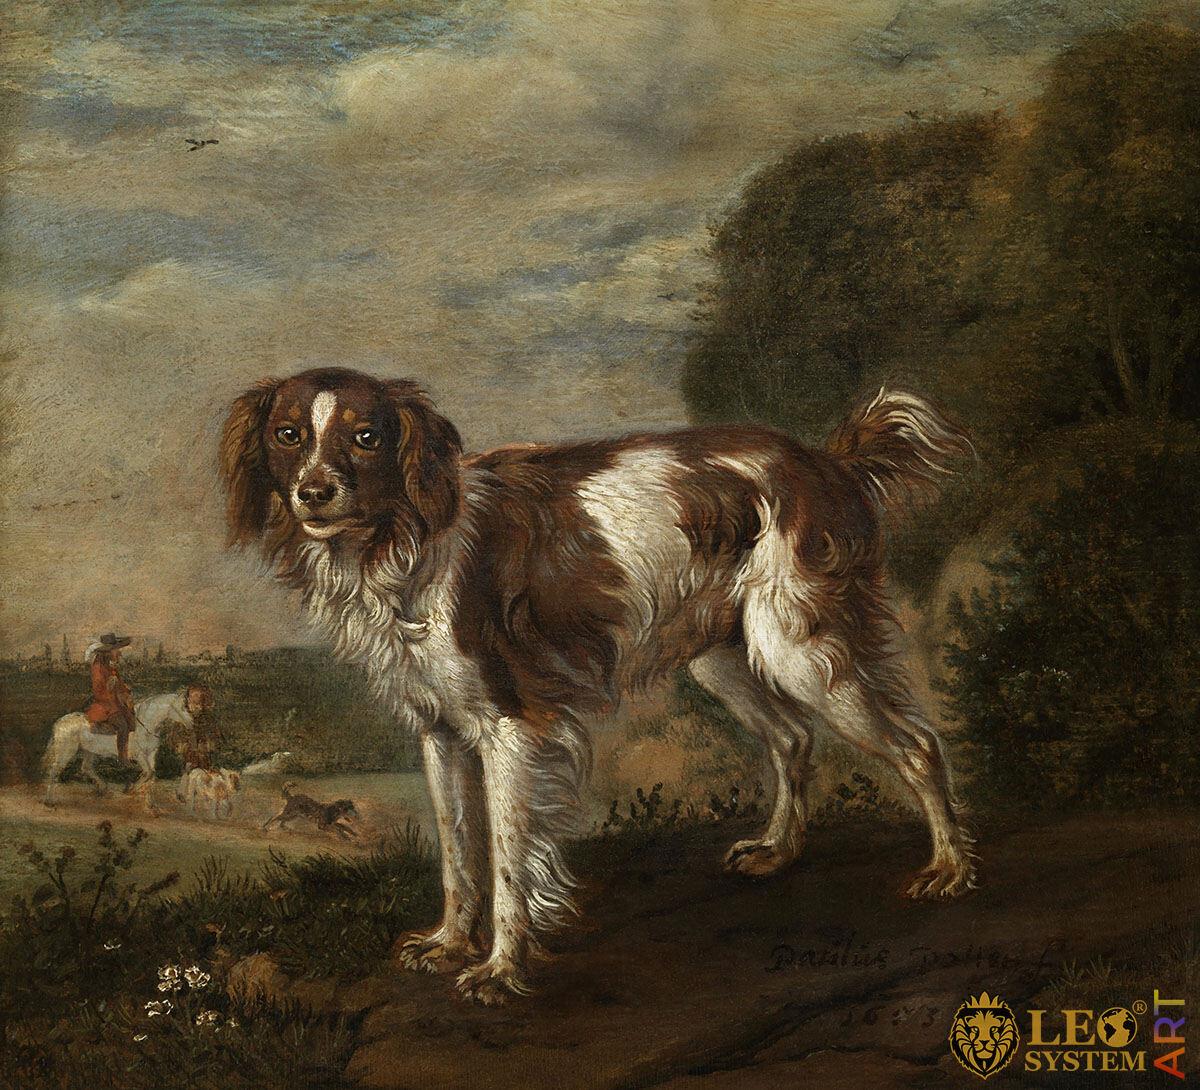 A Spaniel, Artist: Paulus Potter, 1653, Amsterdam, Netherlands, Original painting